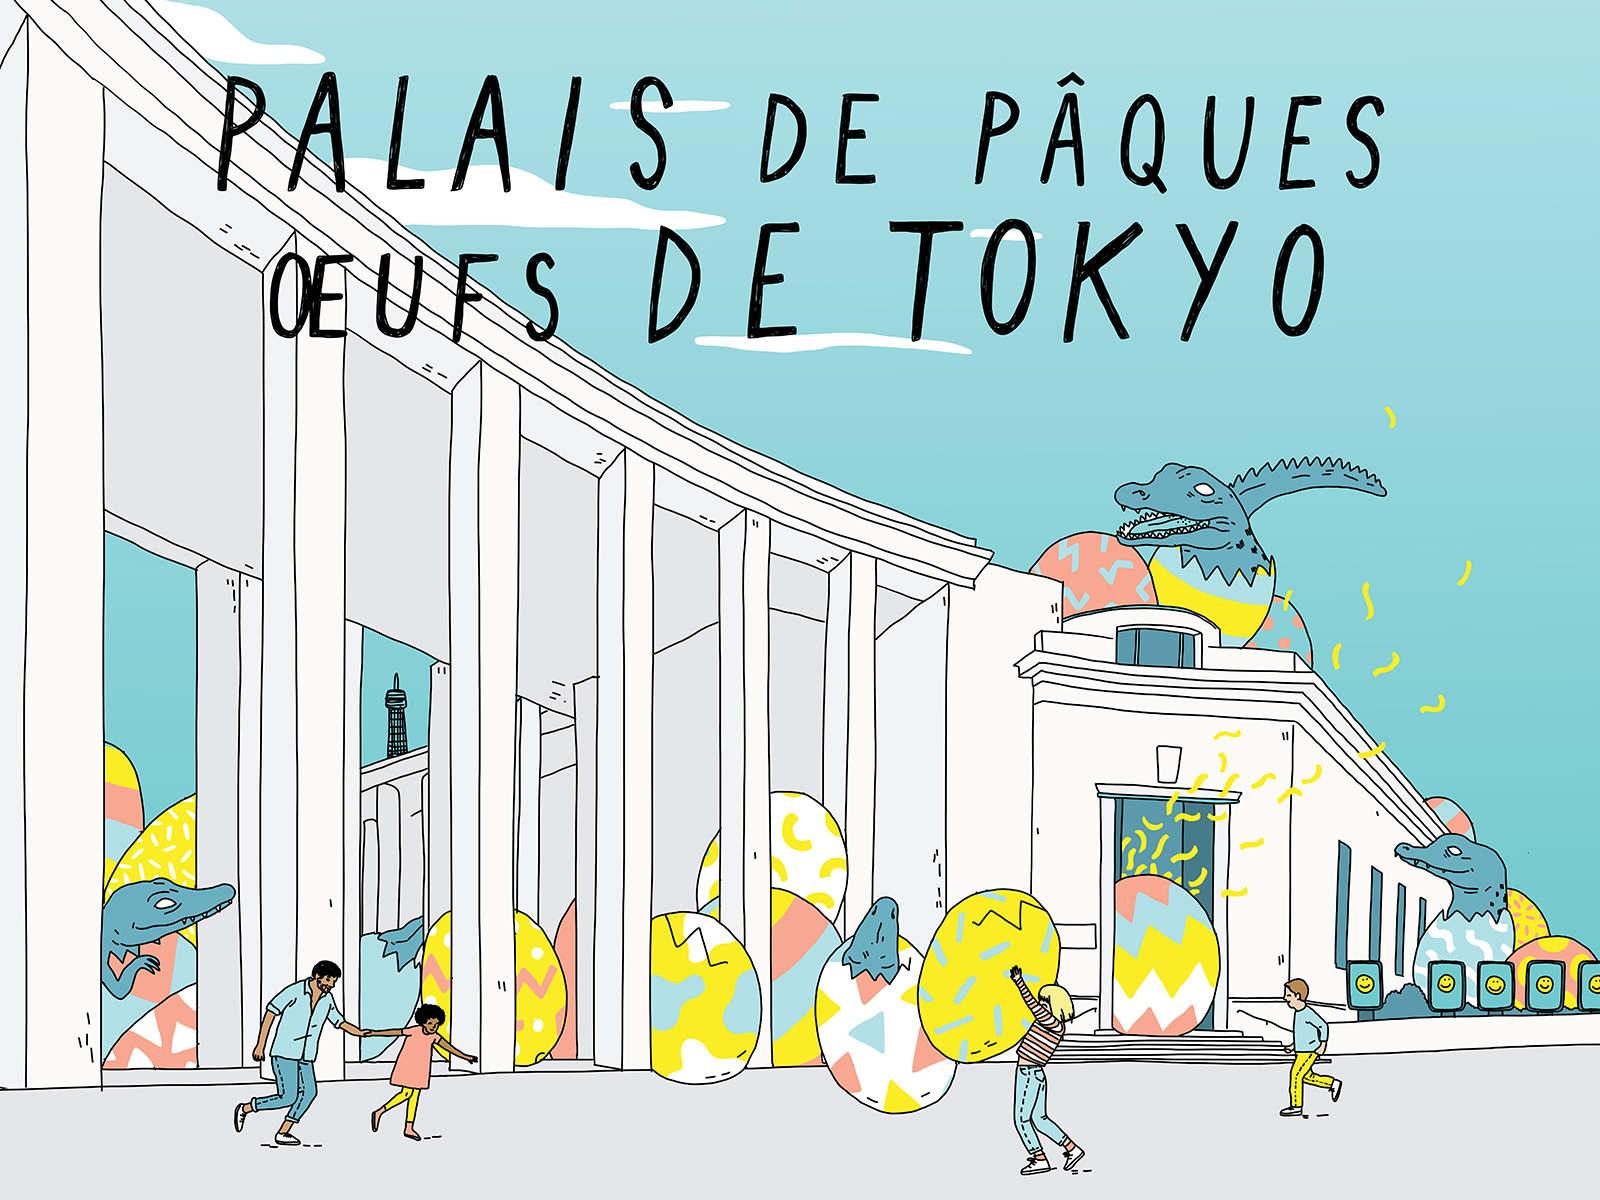 PALAIS DE TOKYO - Anna Wanda Gogusey: Illustration & Graphic